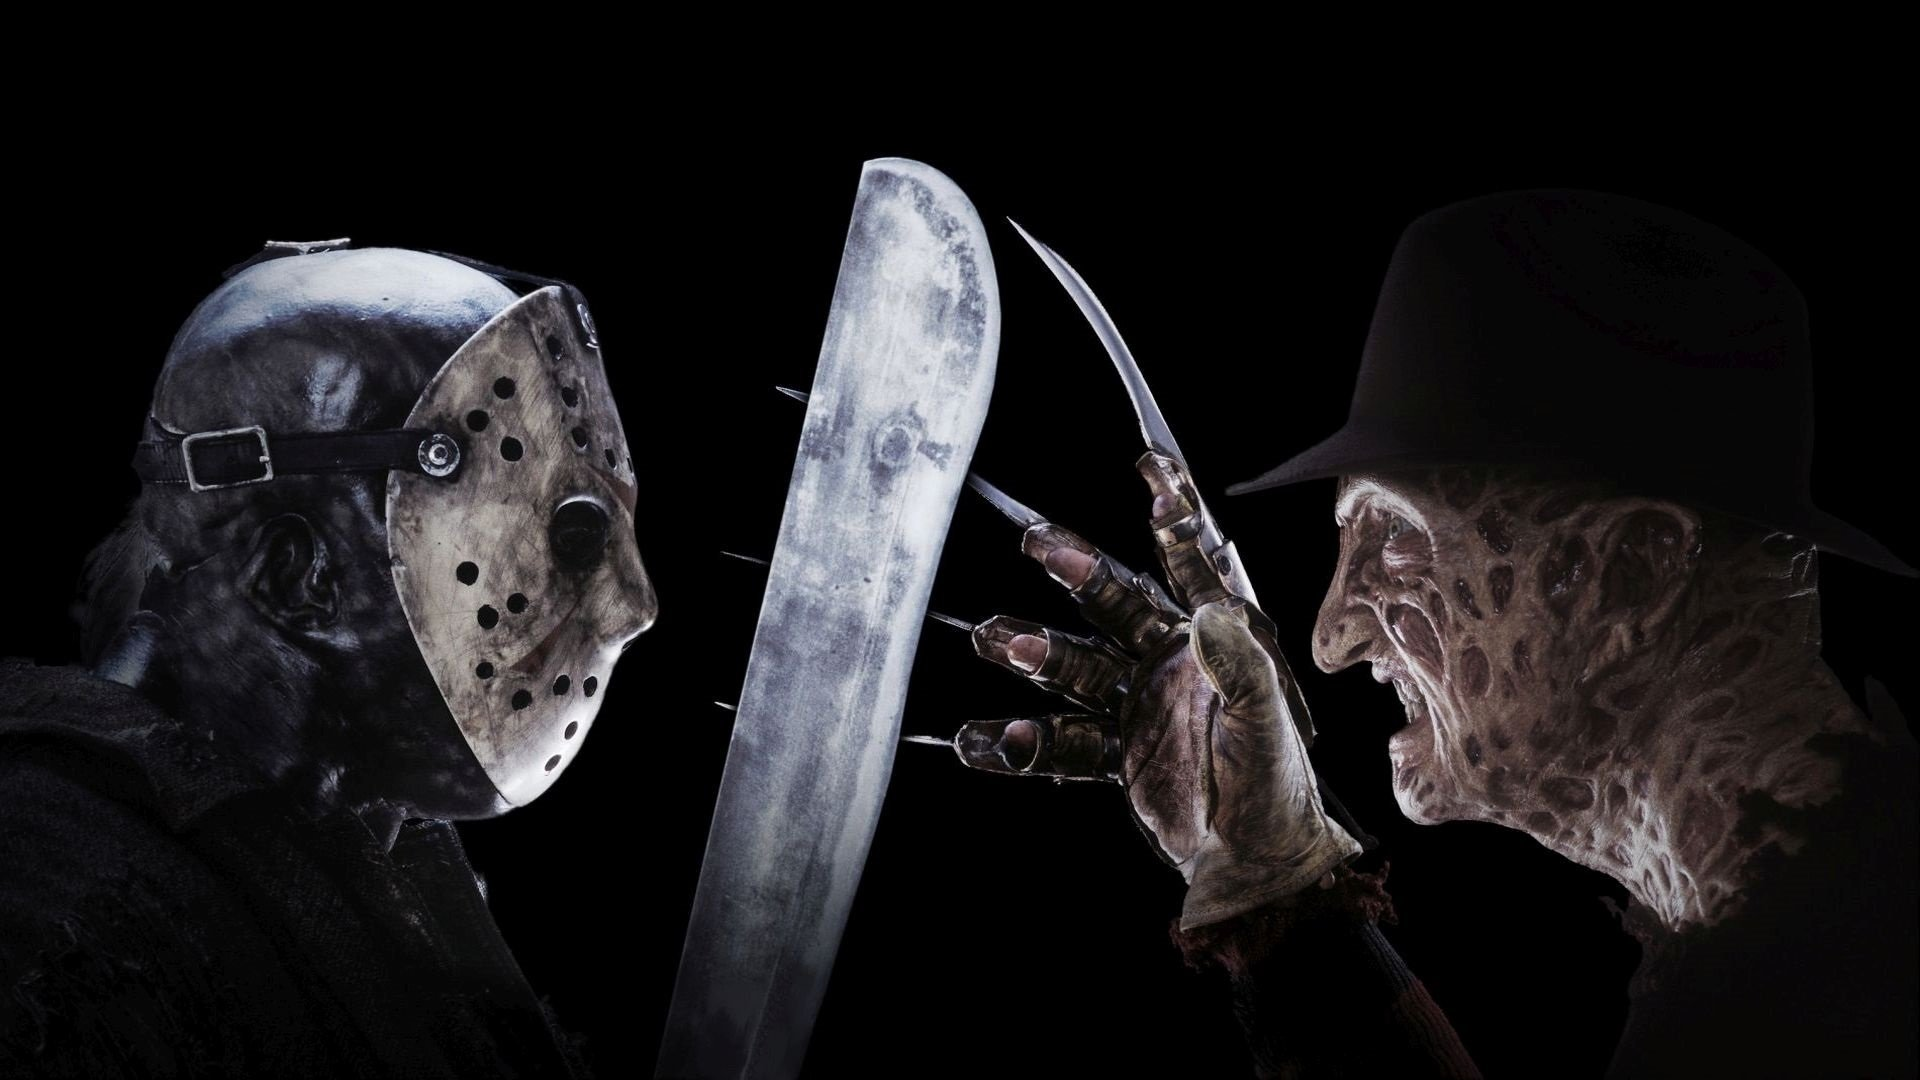 Freddy Vs Jason Full HD Wallpaper And Background Image